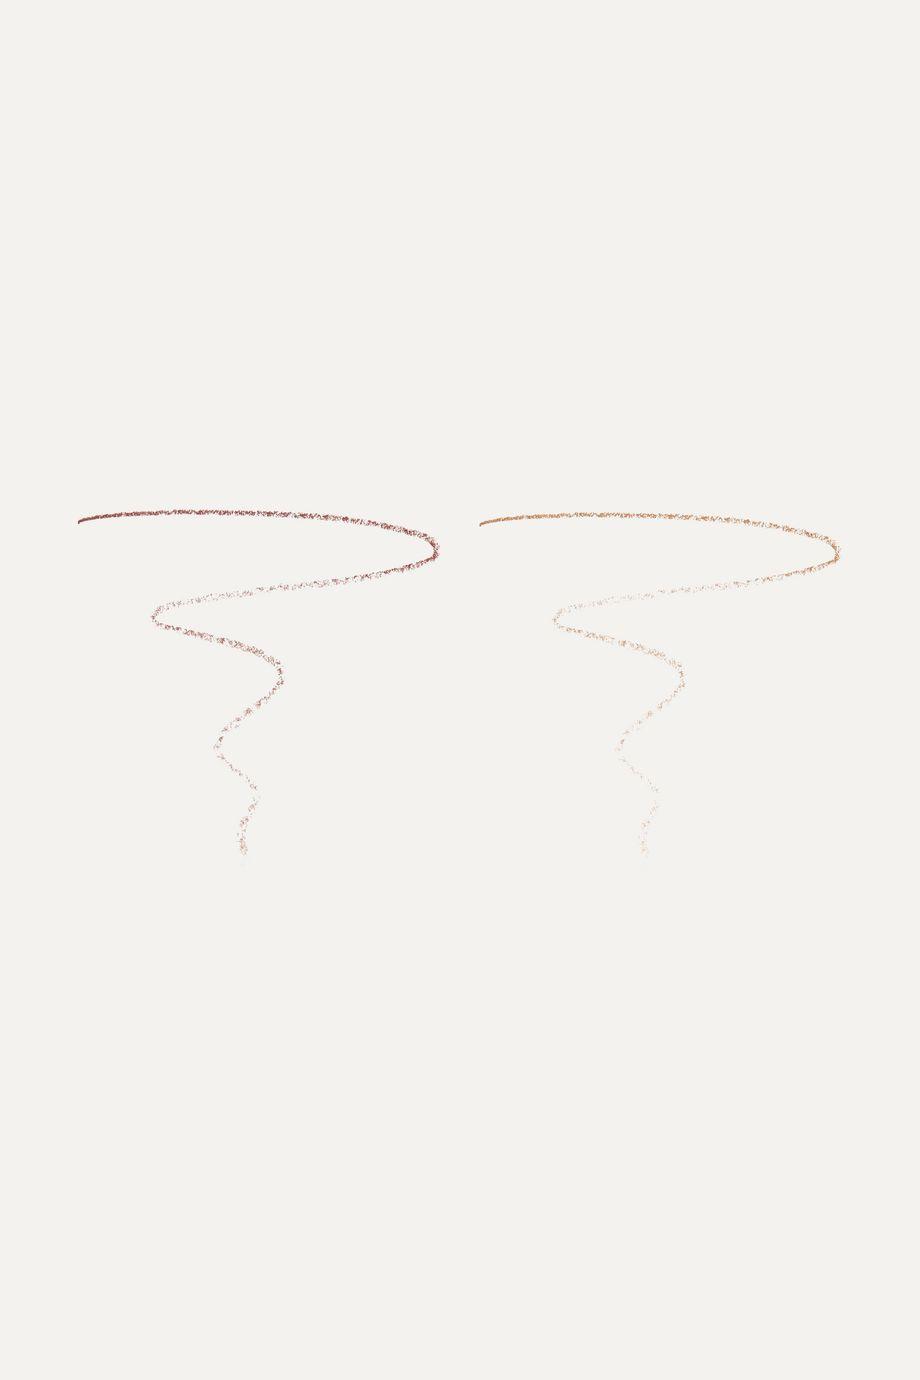 LashFood BrowFood Ultra Fine Brow Pencil Duo - Dark Brunette